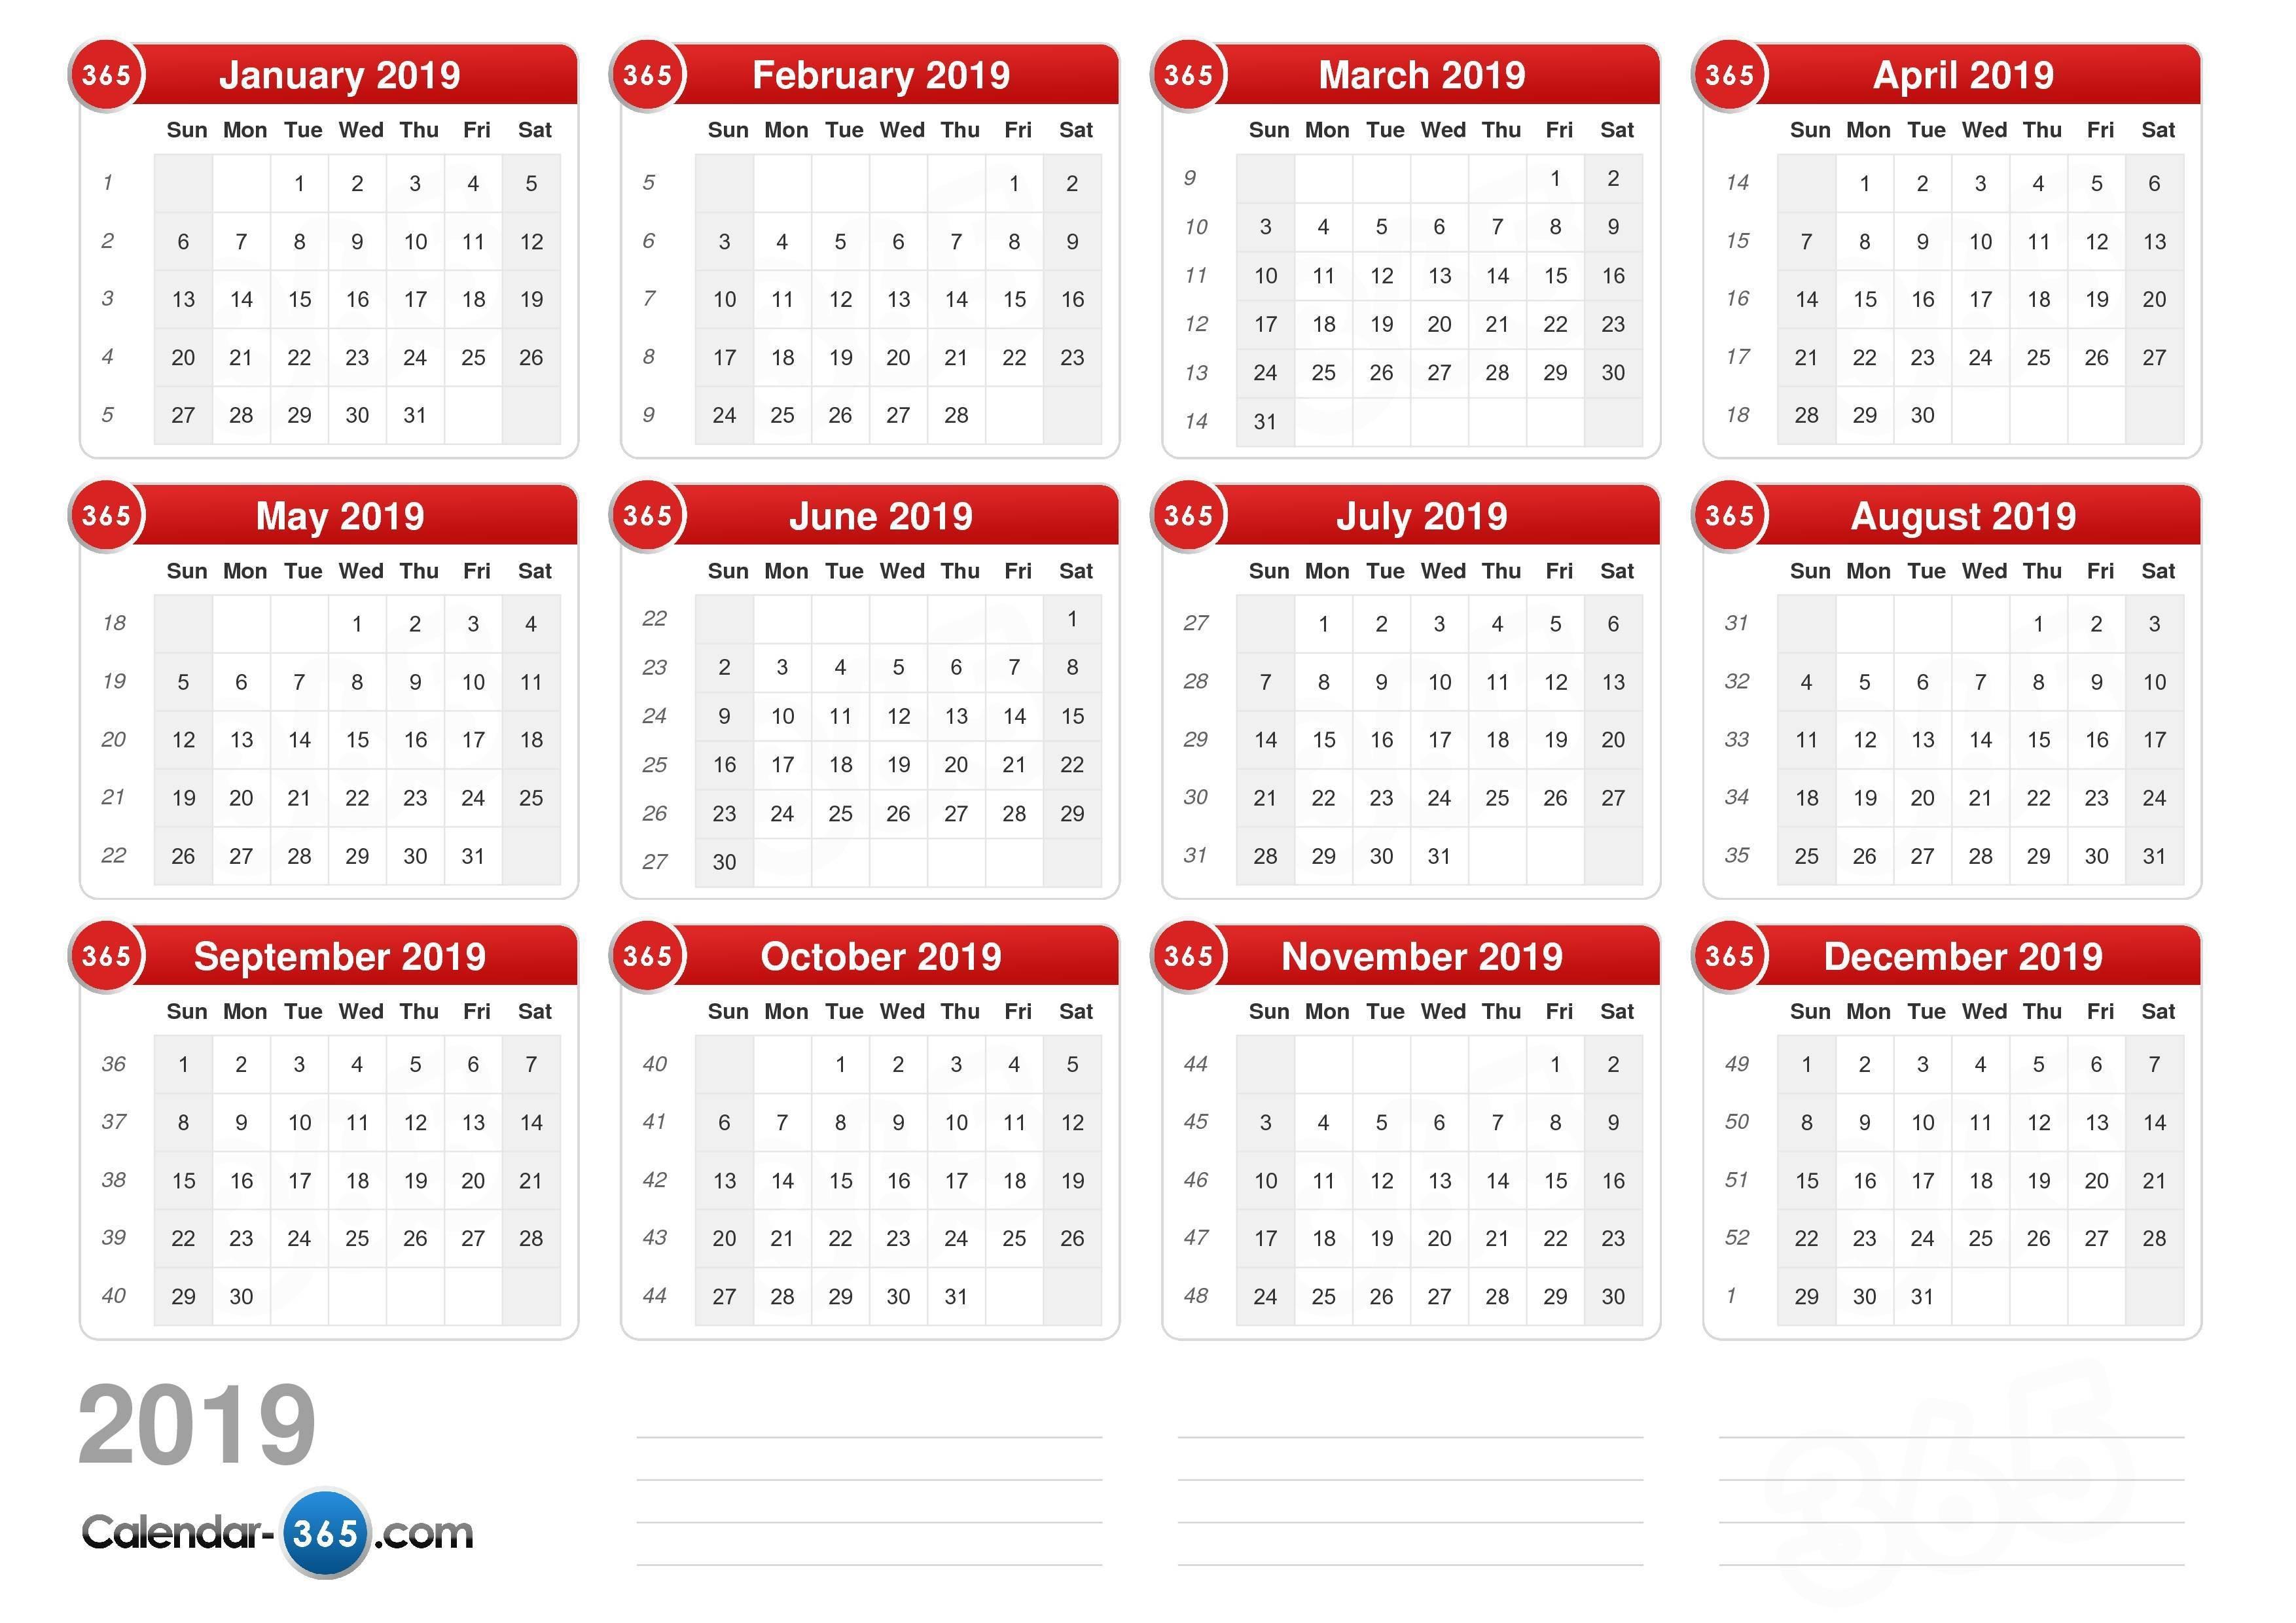 2019 Calendar Calendar 2019 Calendar